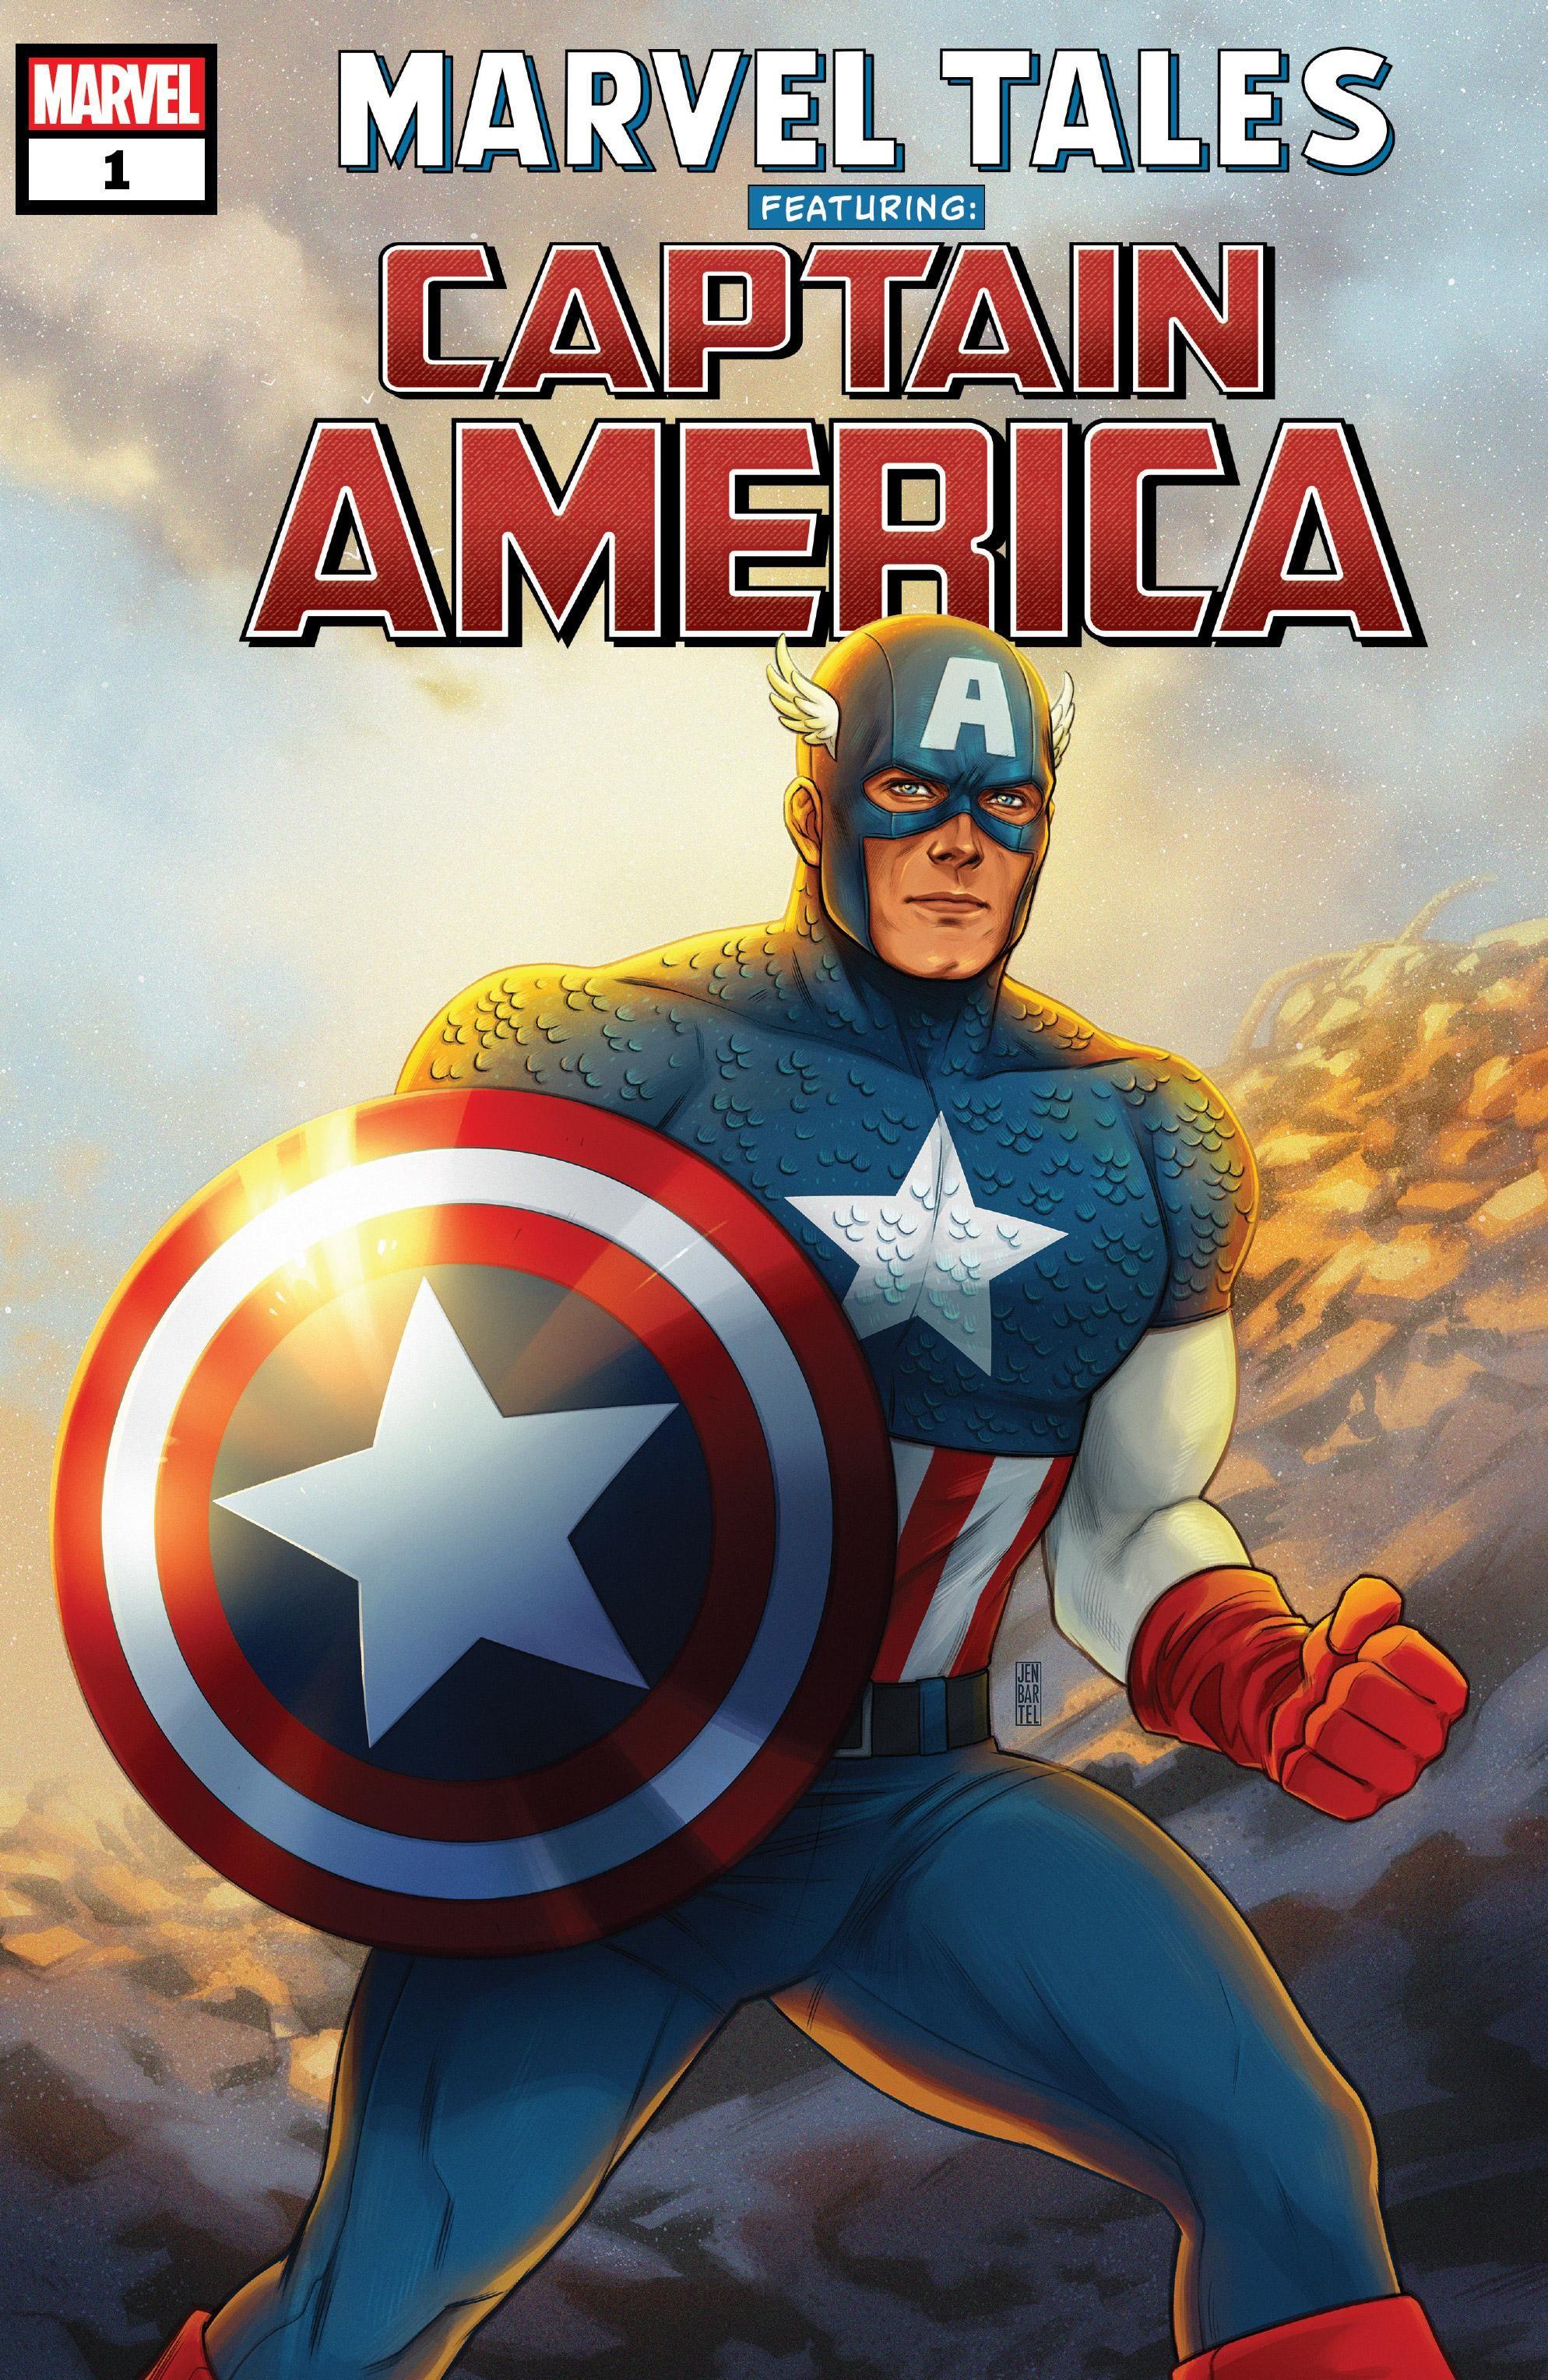 Marvel Tales: Captain America Vol 1 1